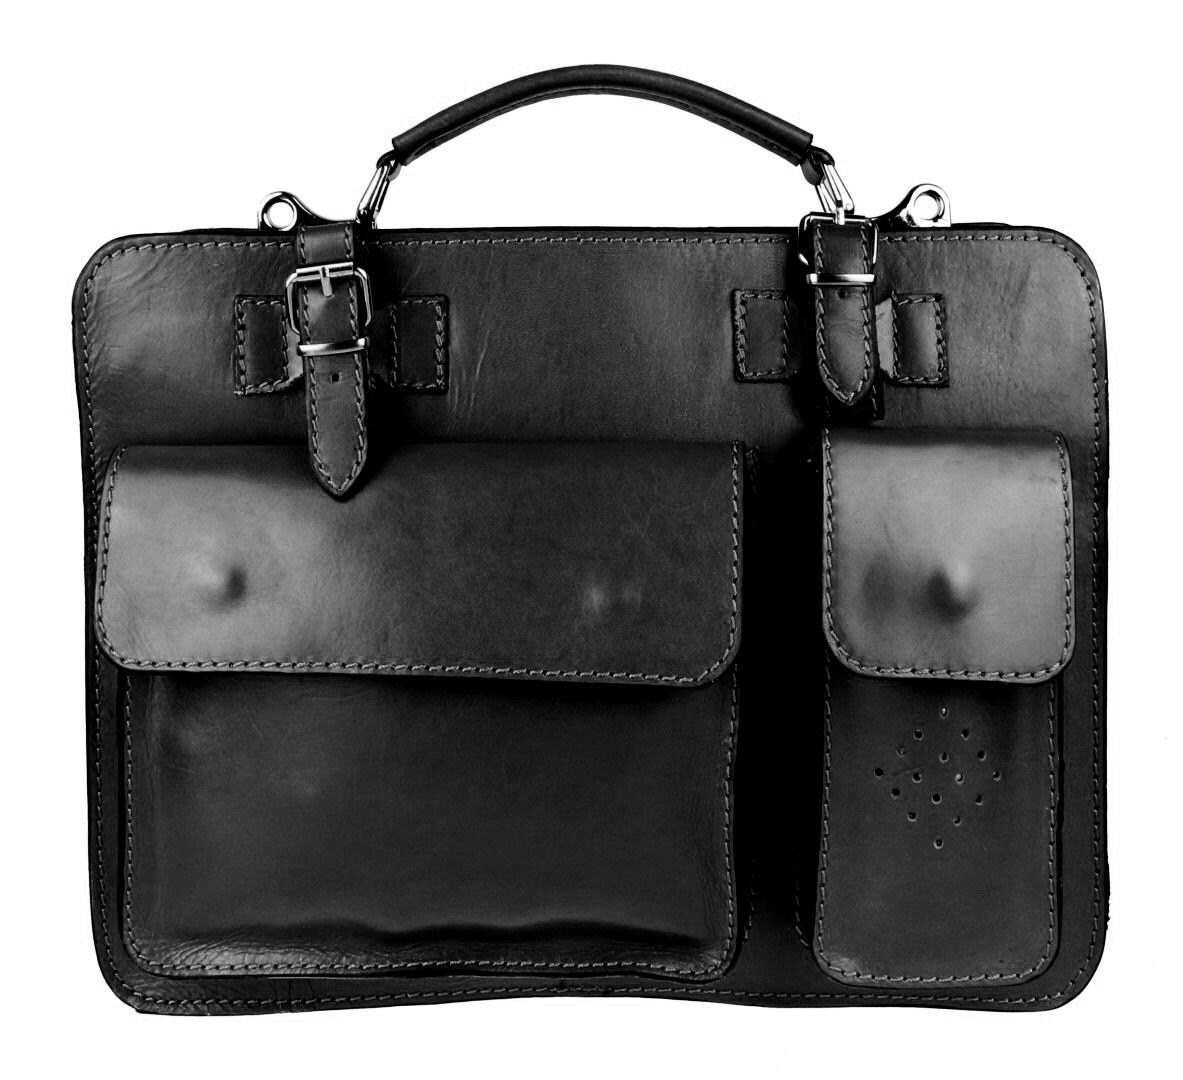 Medium Tan Black Hard Genuine Calf Leather Satchel Shoulder Briefcase Italian Made in Italy Office Bag